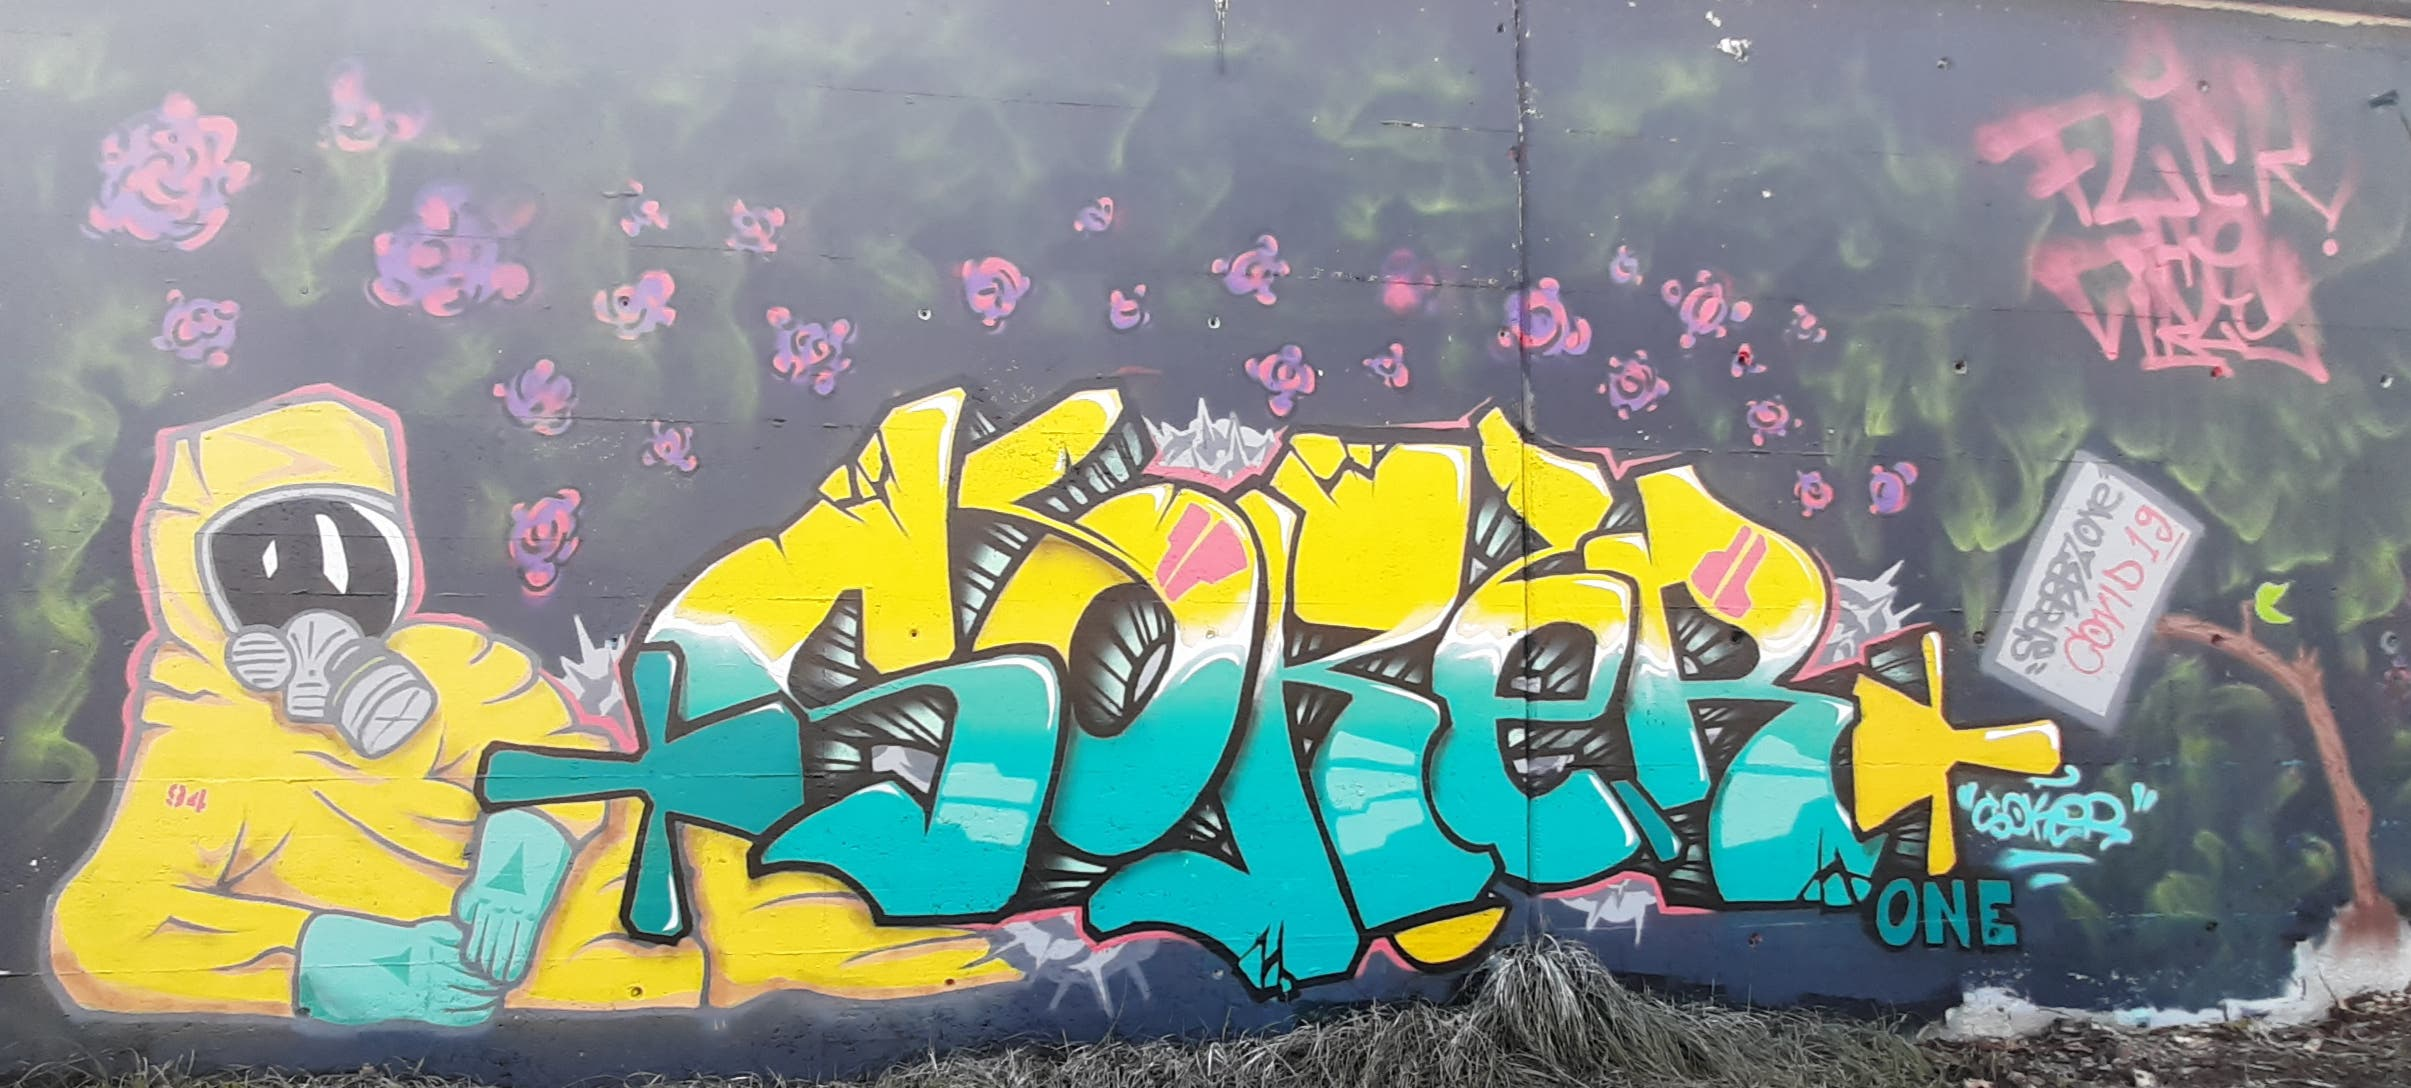 Ein Graffiti.